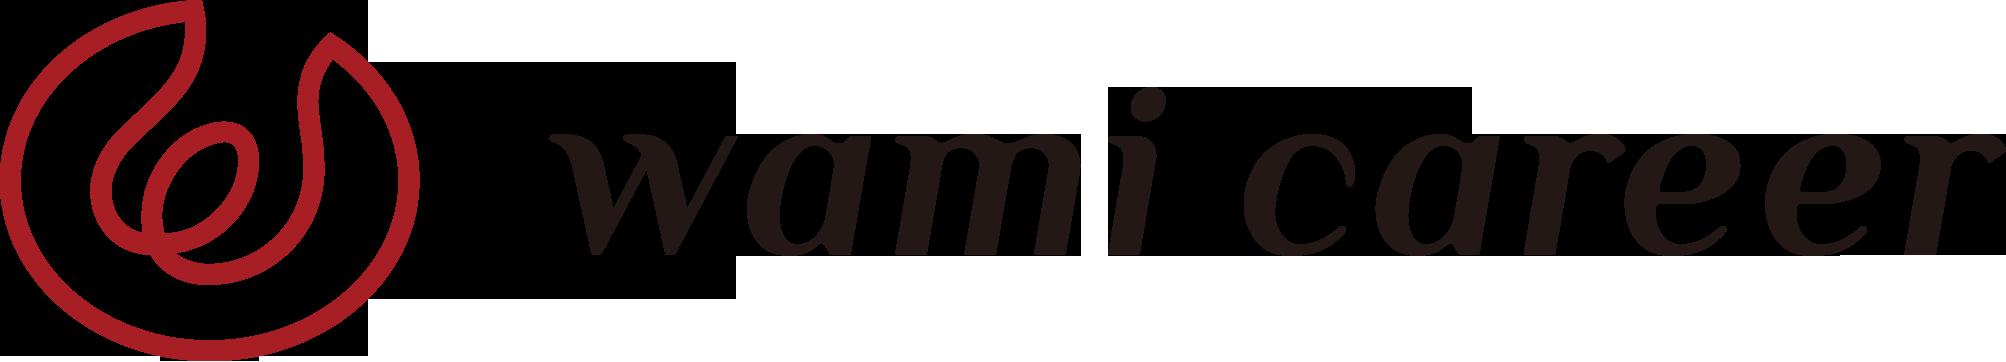 wami career | オンライン転職サポート